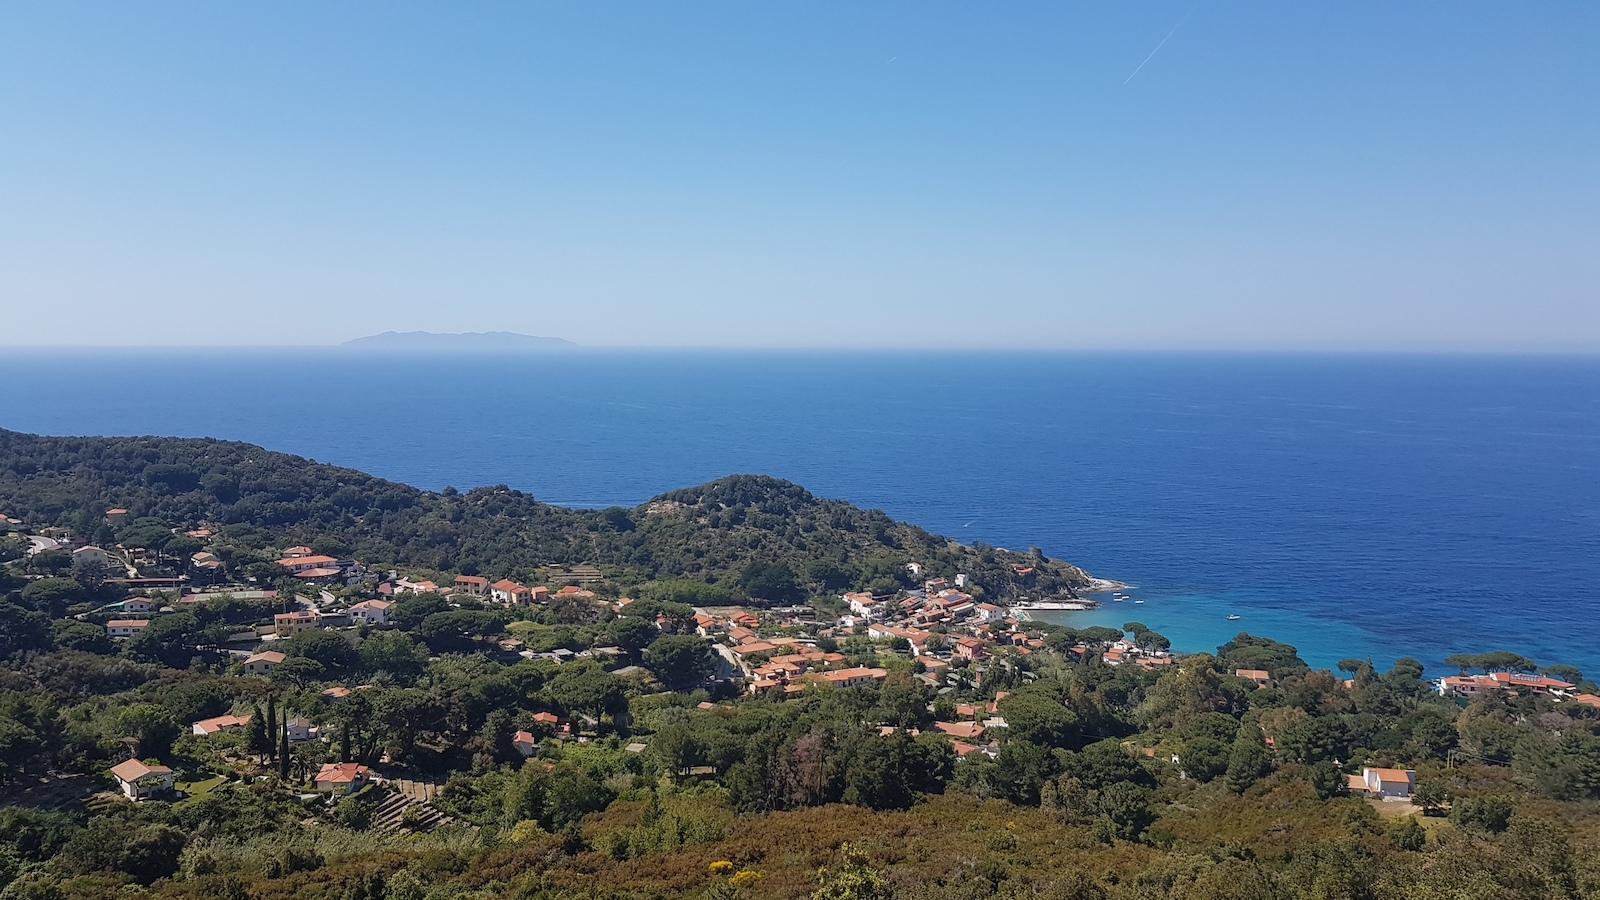 Isola d'Elba Ovest (DX) 13